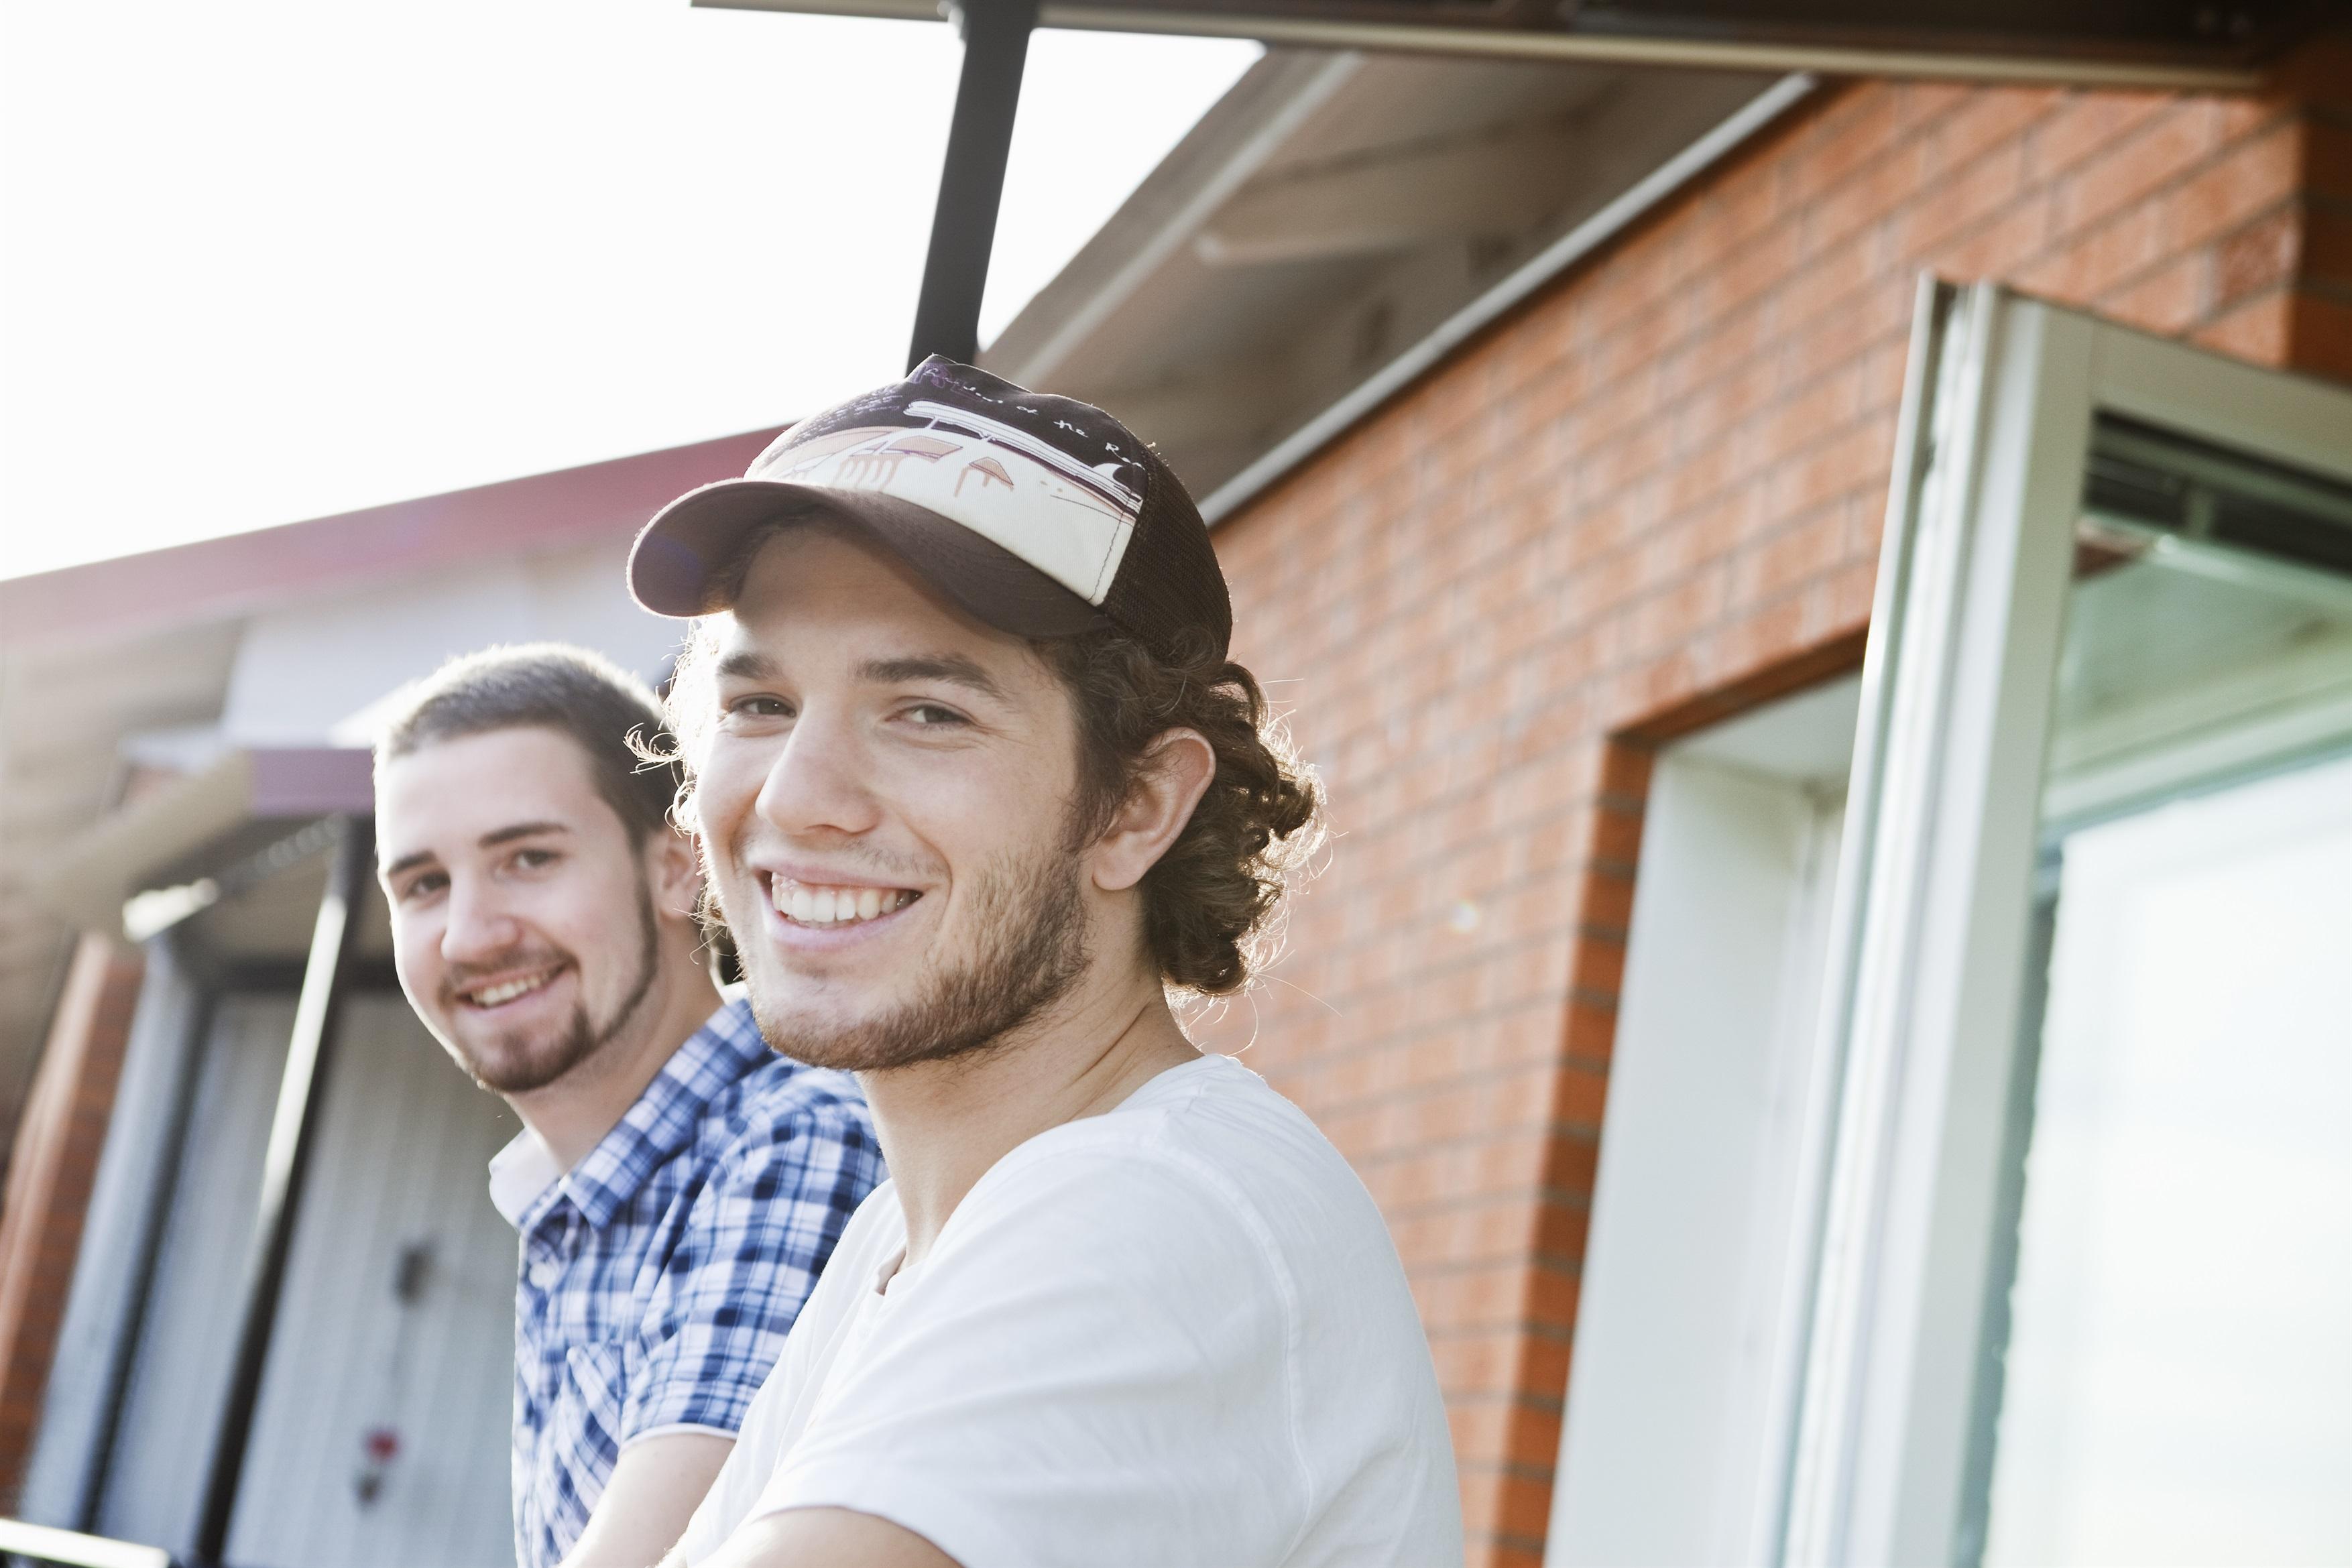 Unga killar på balkong